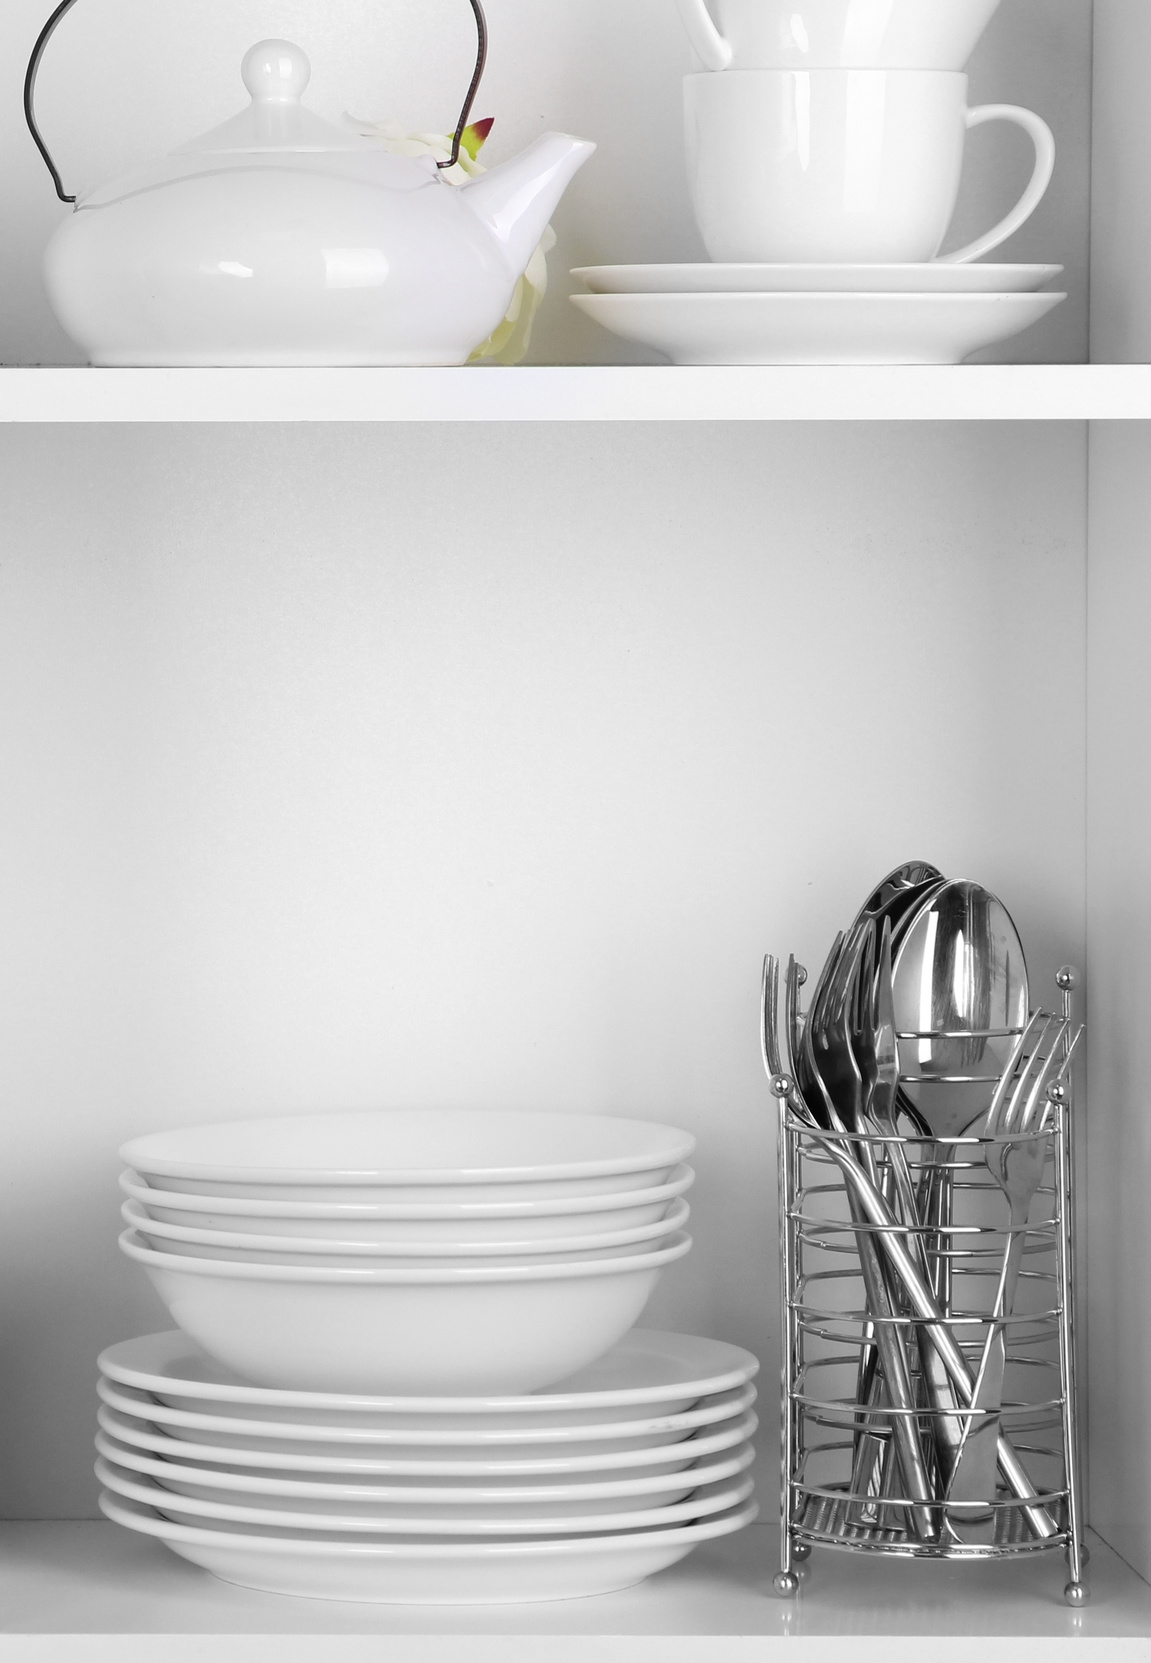 clean-interior-decor-porcelain-dishes-crystal-flatware-on-white-shelves-66623576.jpg